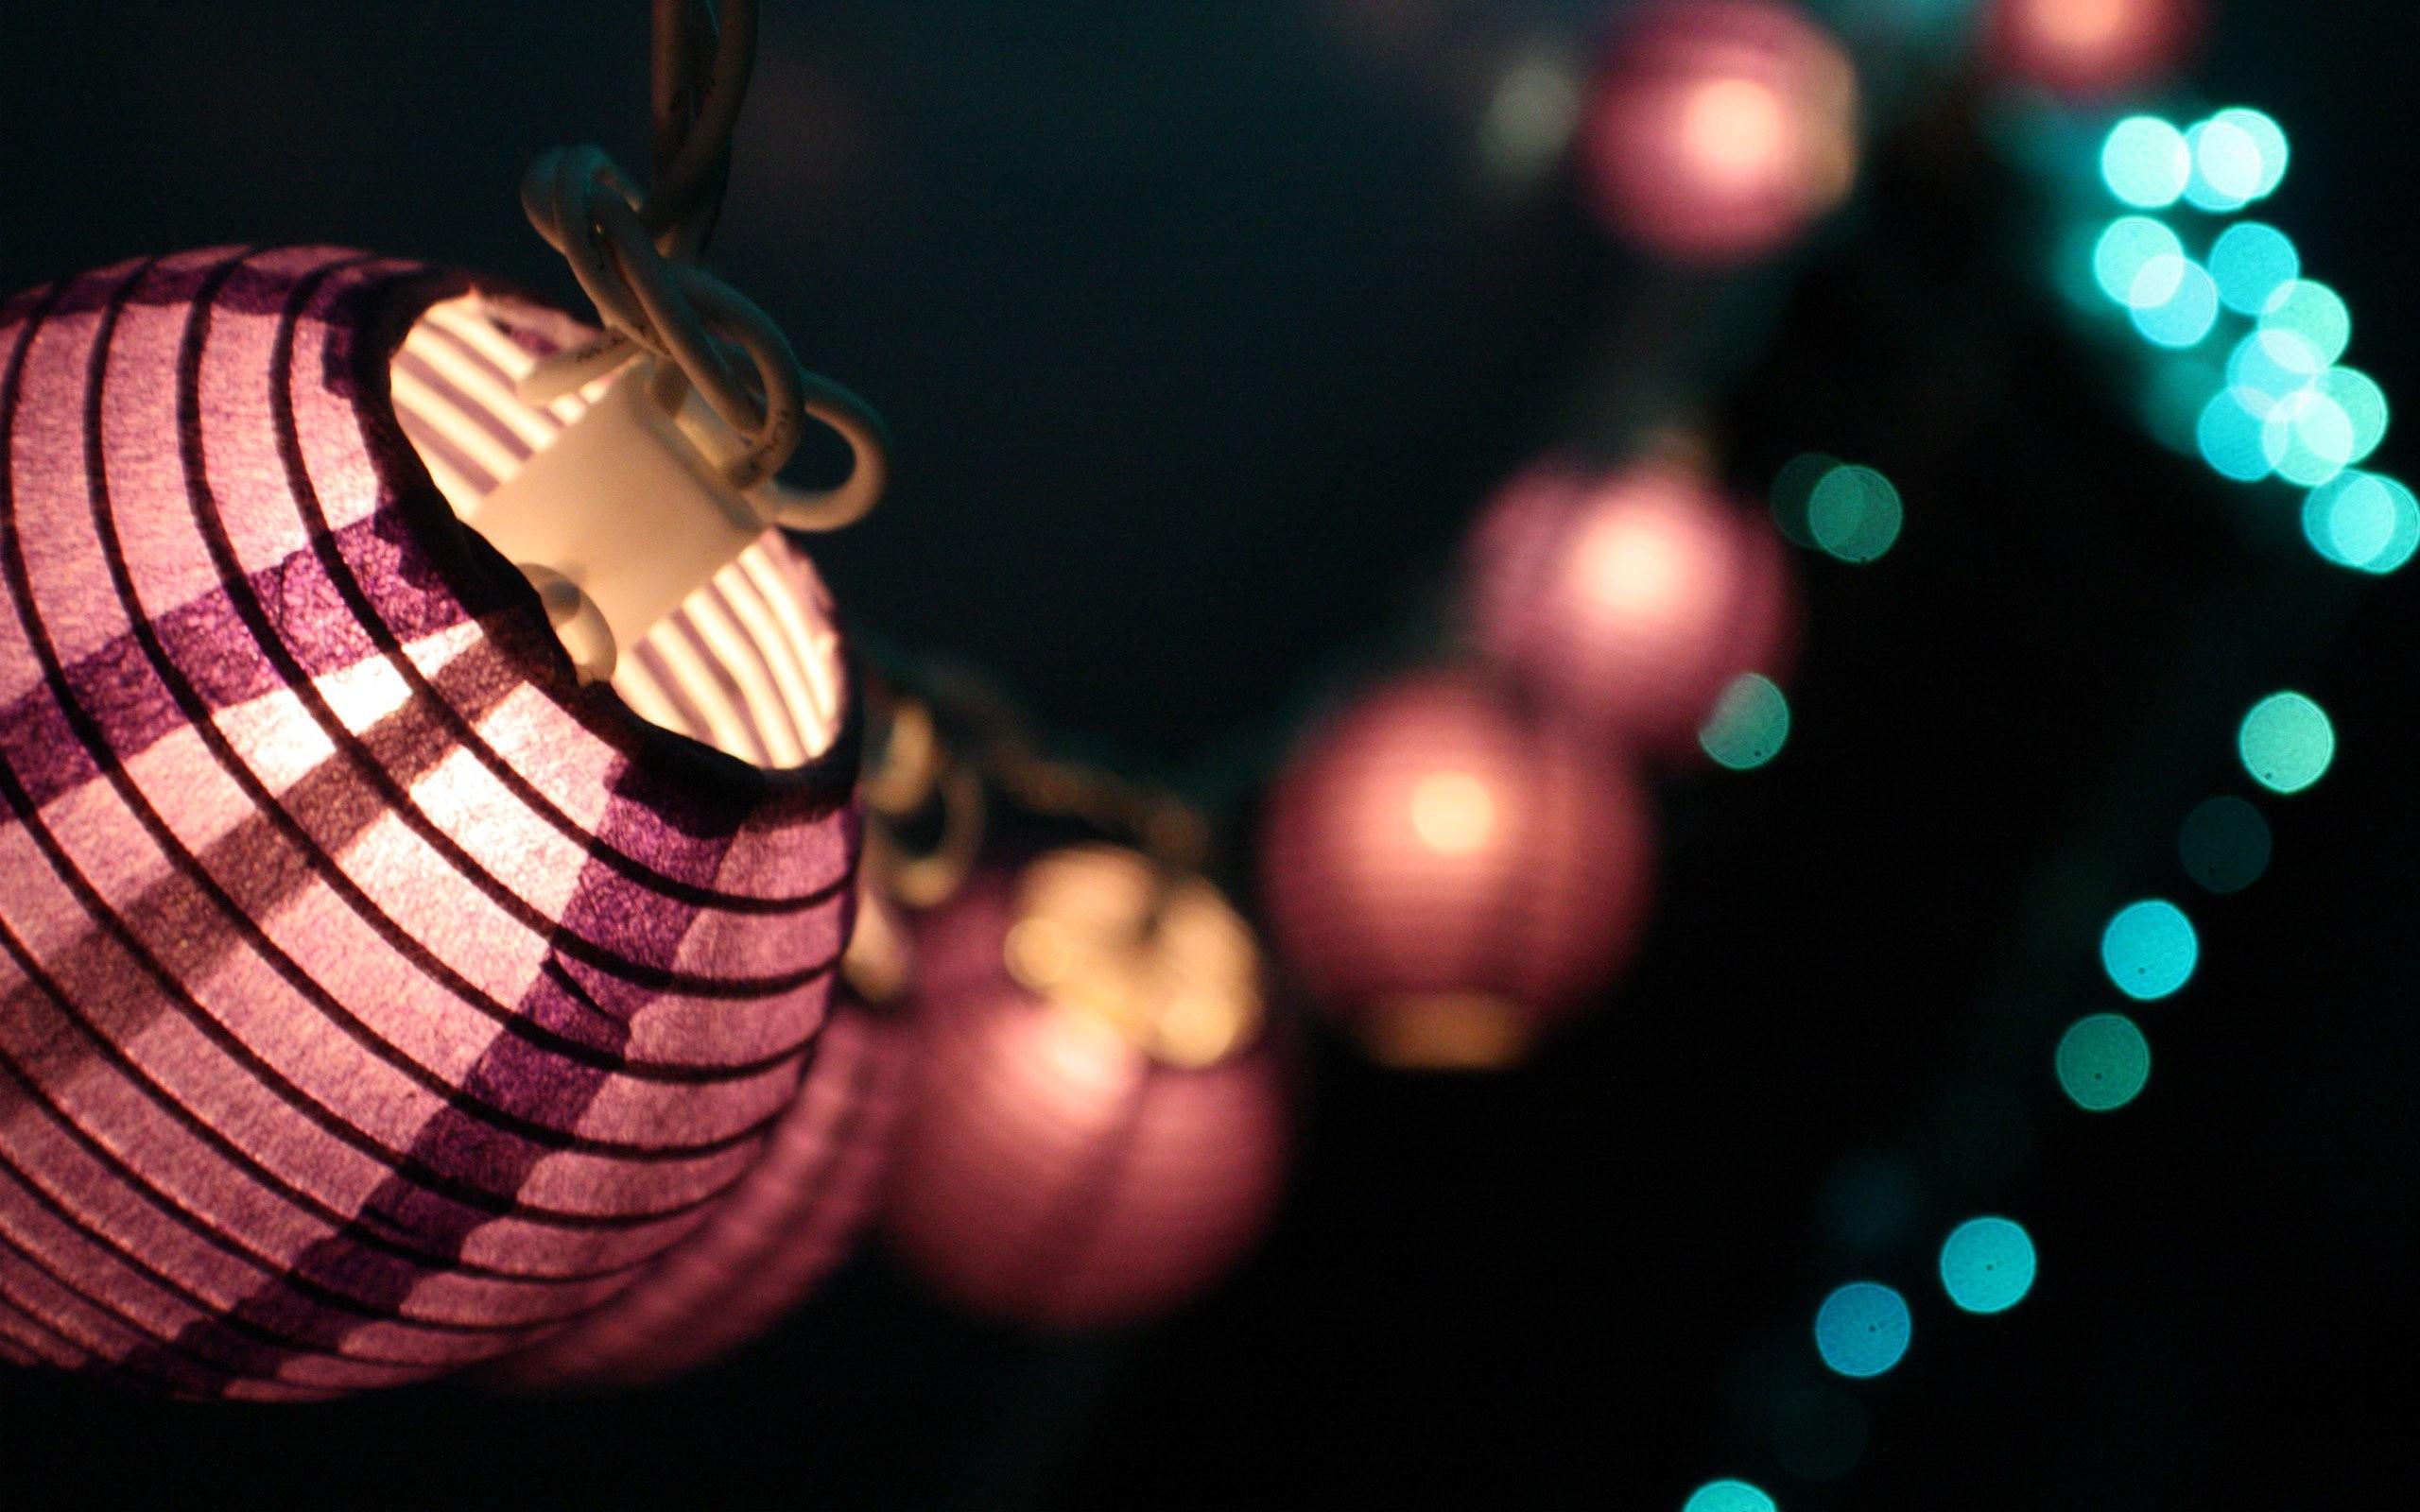 lantern wallpaper 23552 24204 hd wallpapersjpg 2560x1600